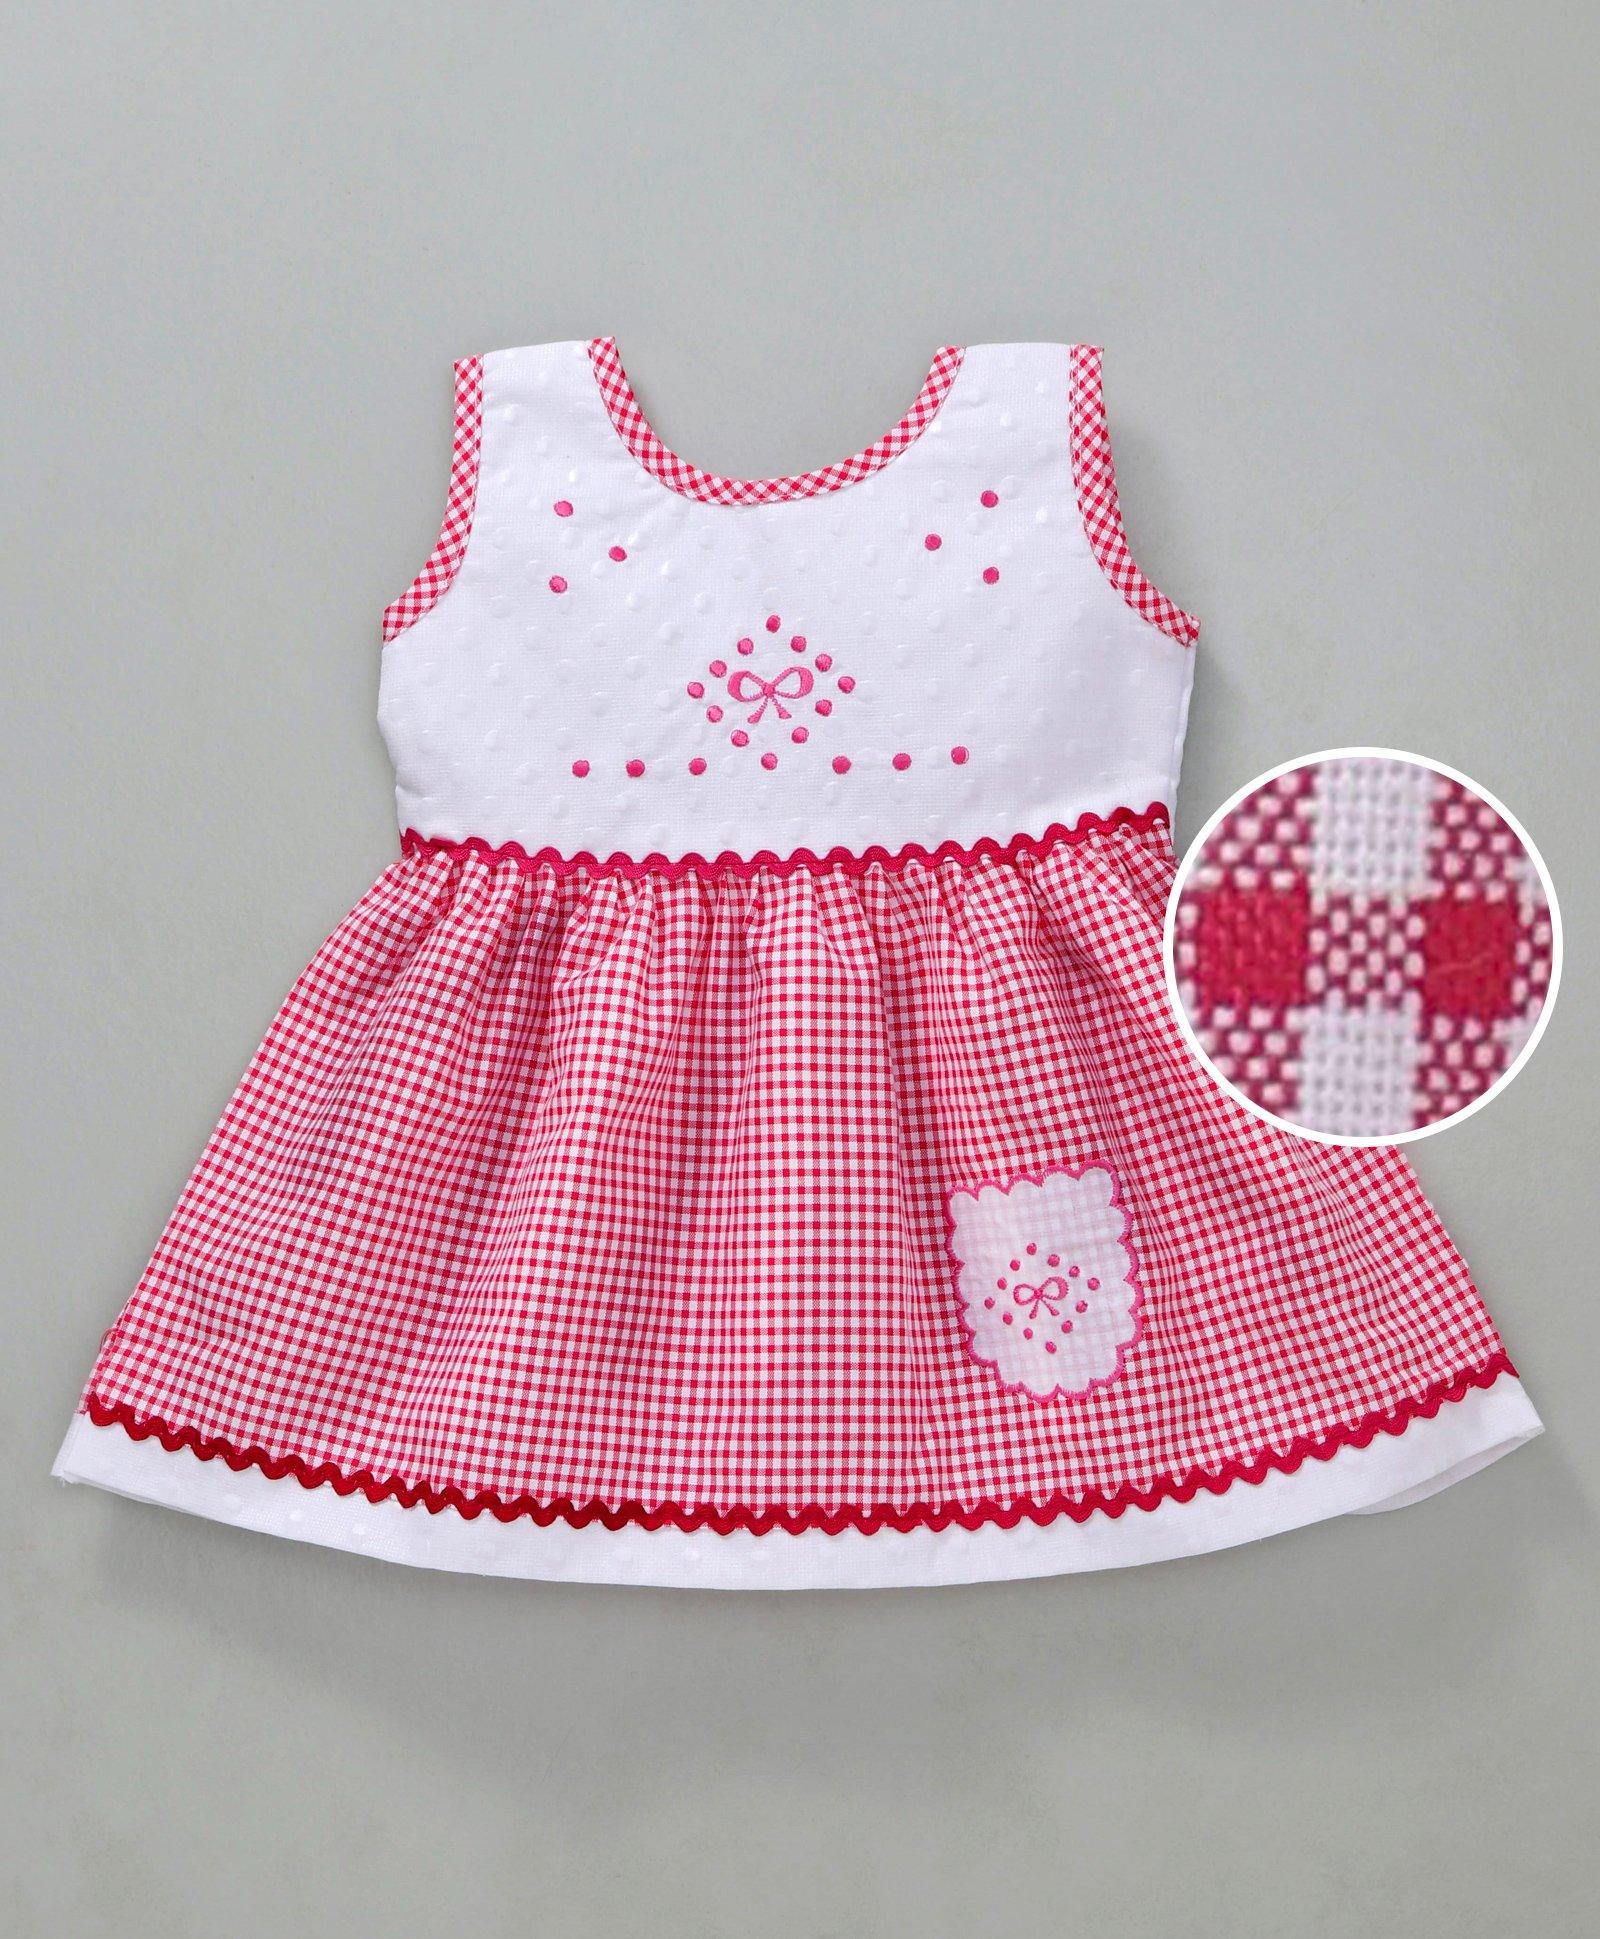 da262d3ab 0 3 Months Baby Girl Dresses Online Shopping - raveitsafe